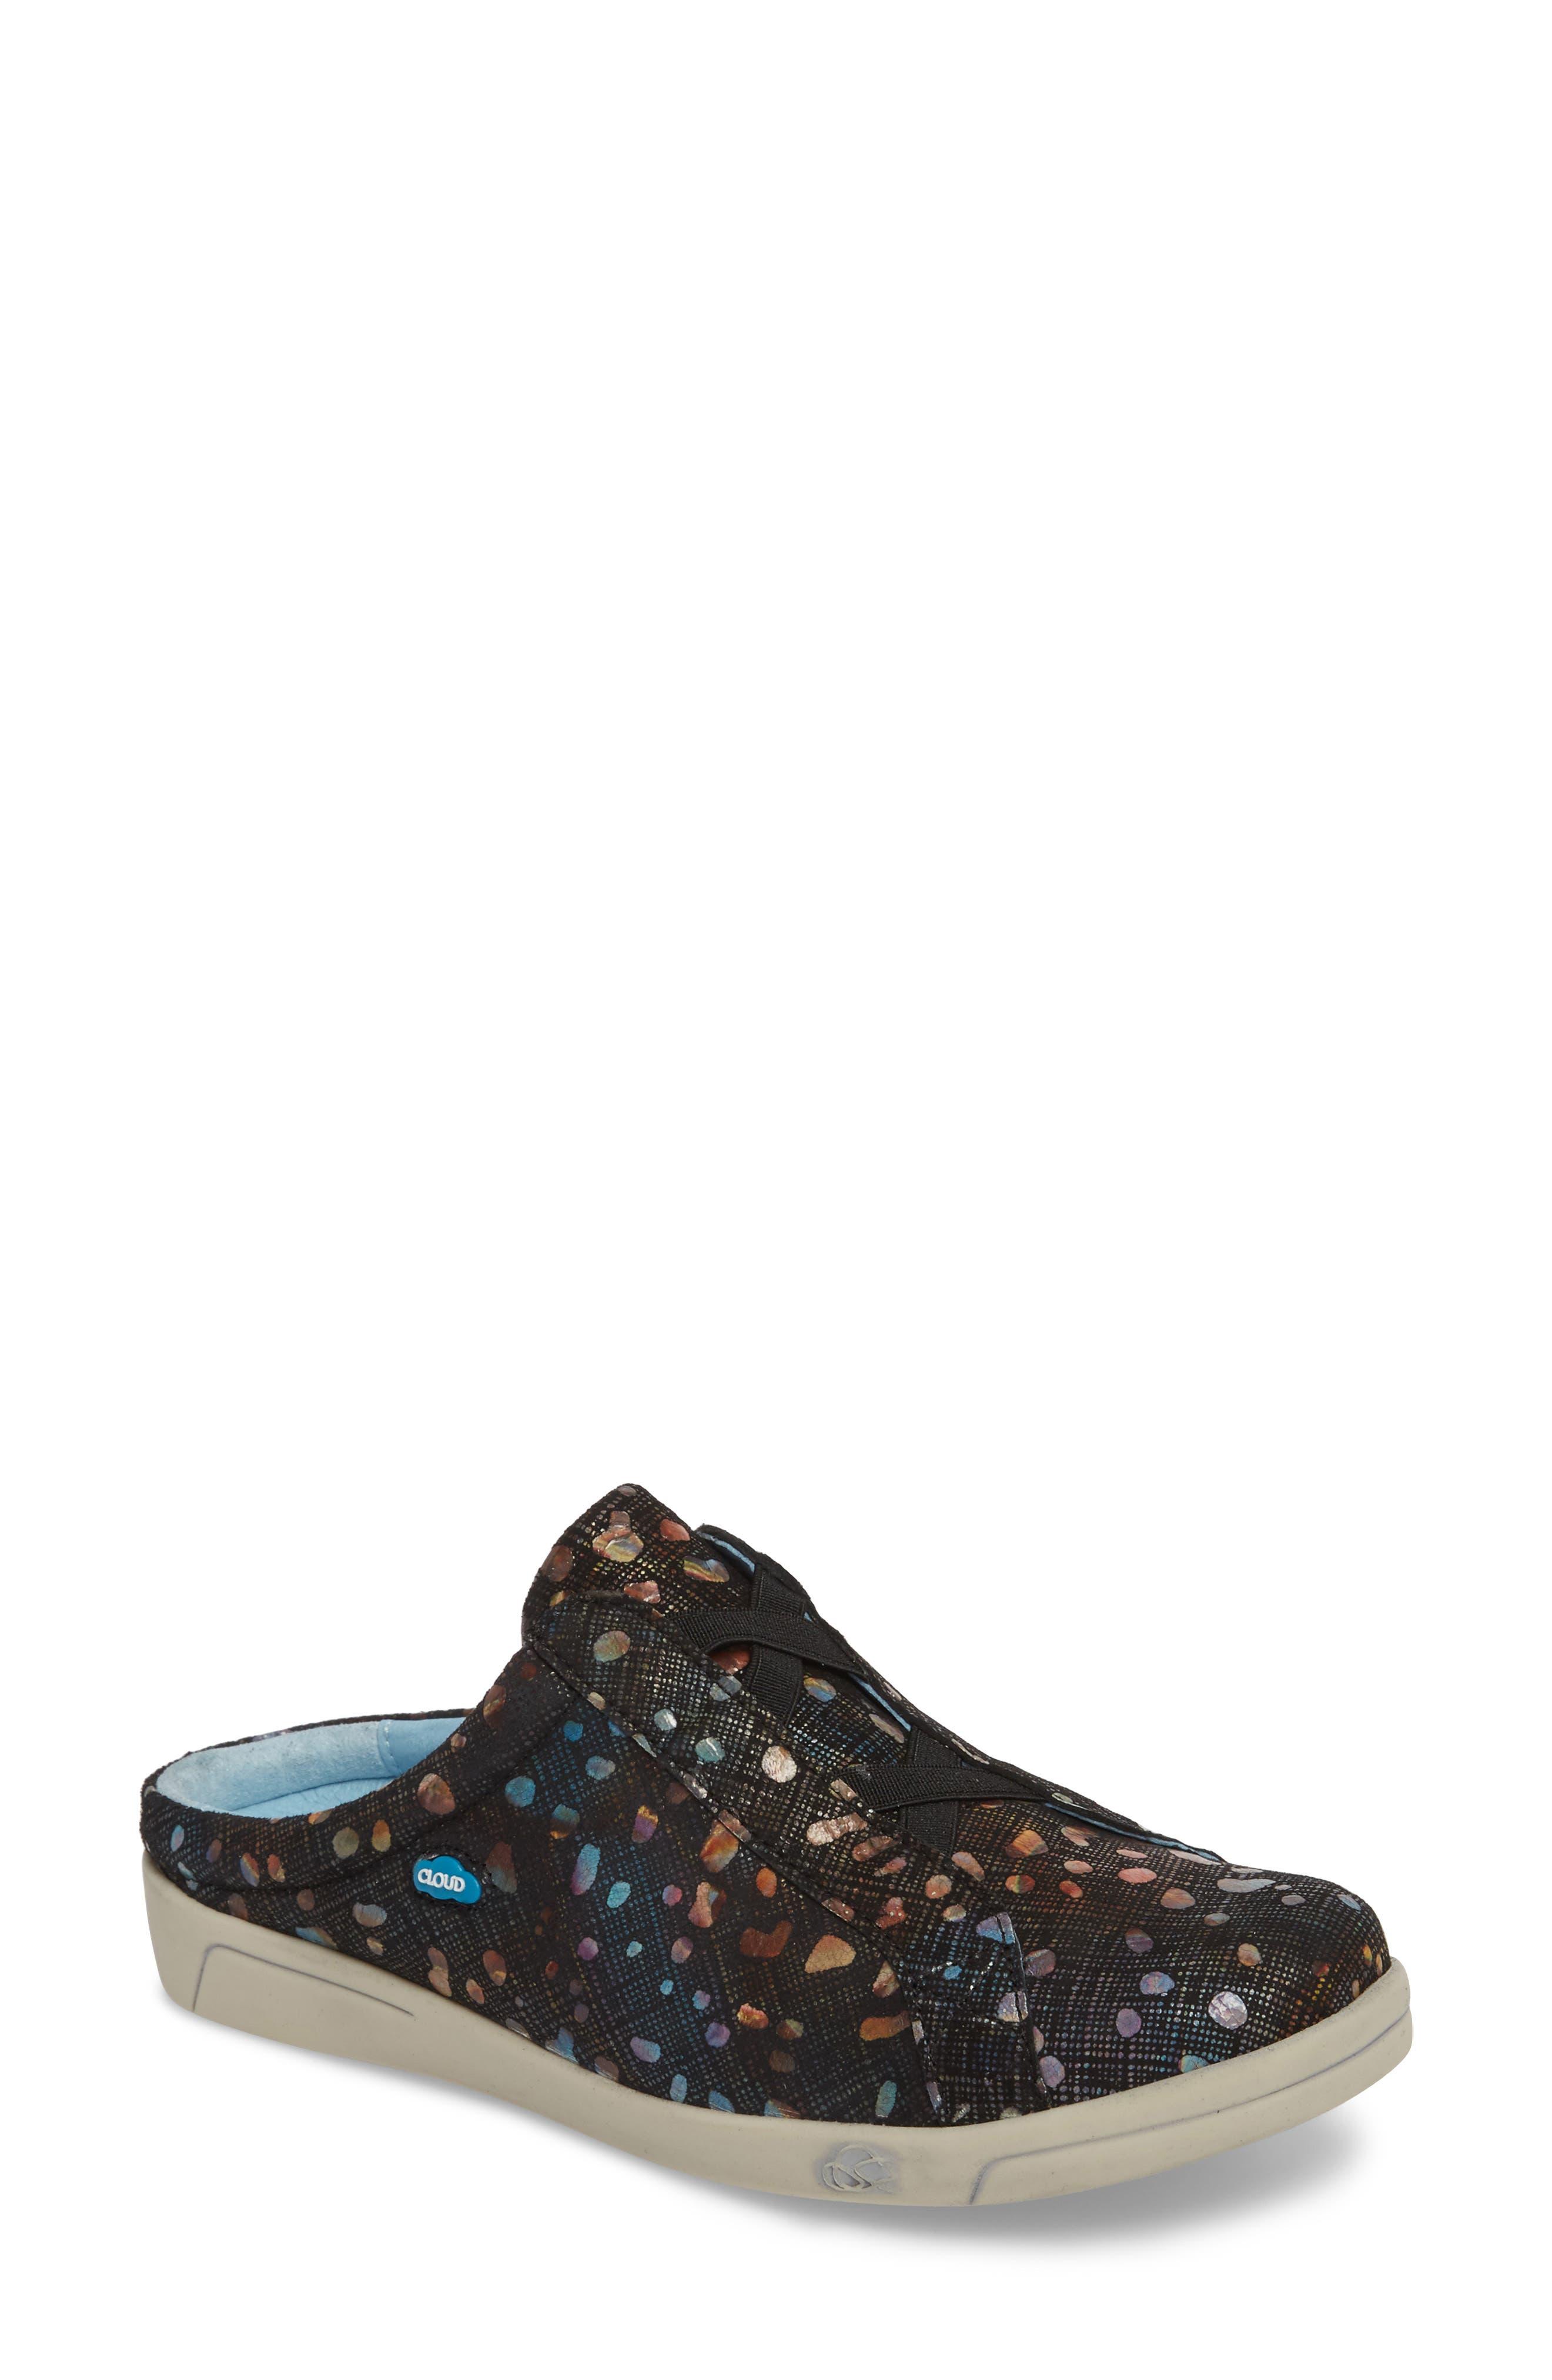 Arizona Fantasy Mule Sneaker,                             Main thumbnail 1, color,                             Bubble Leather